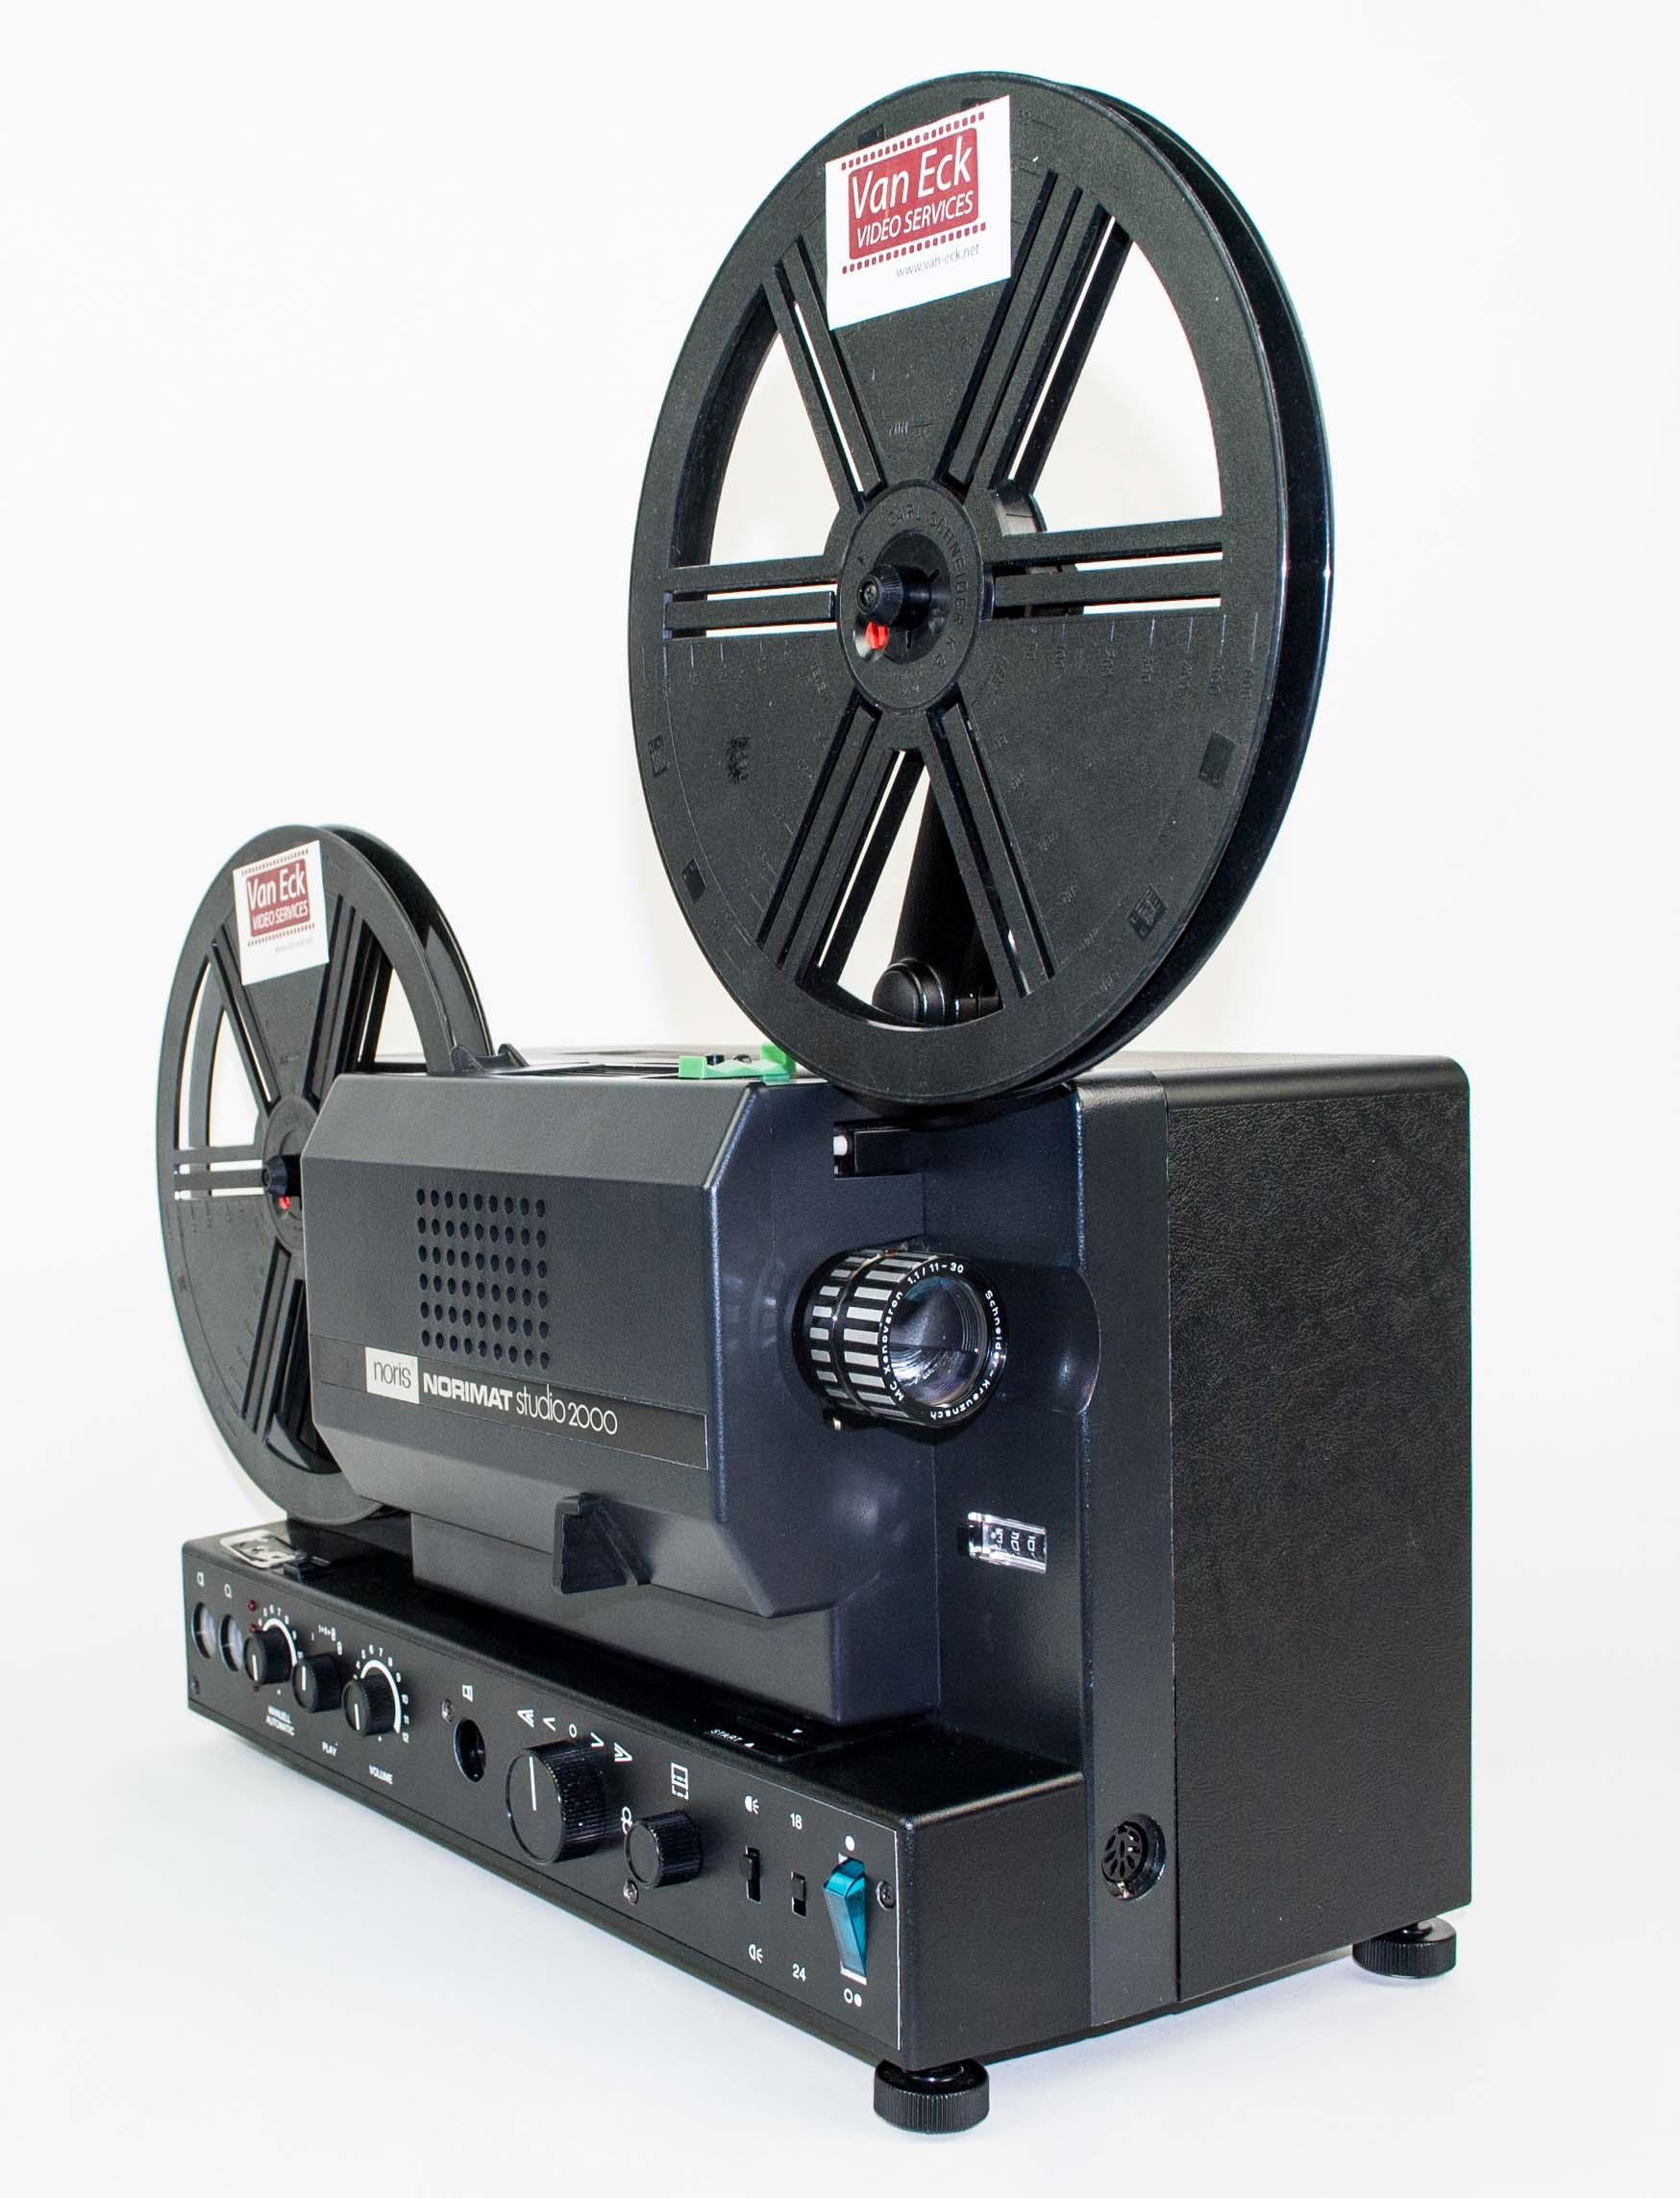 Norimat Electronic Studio 2000